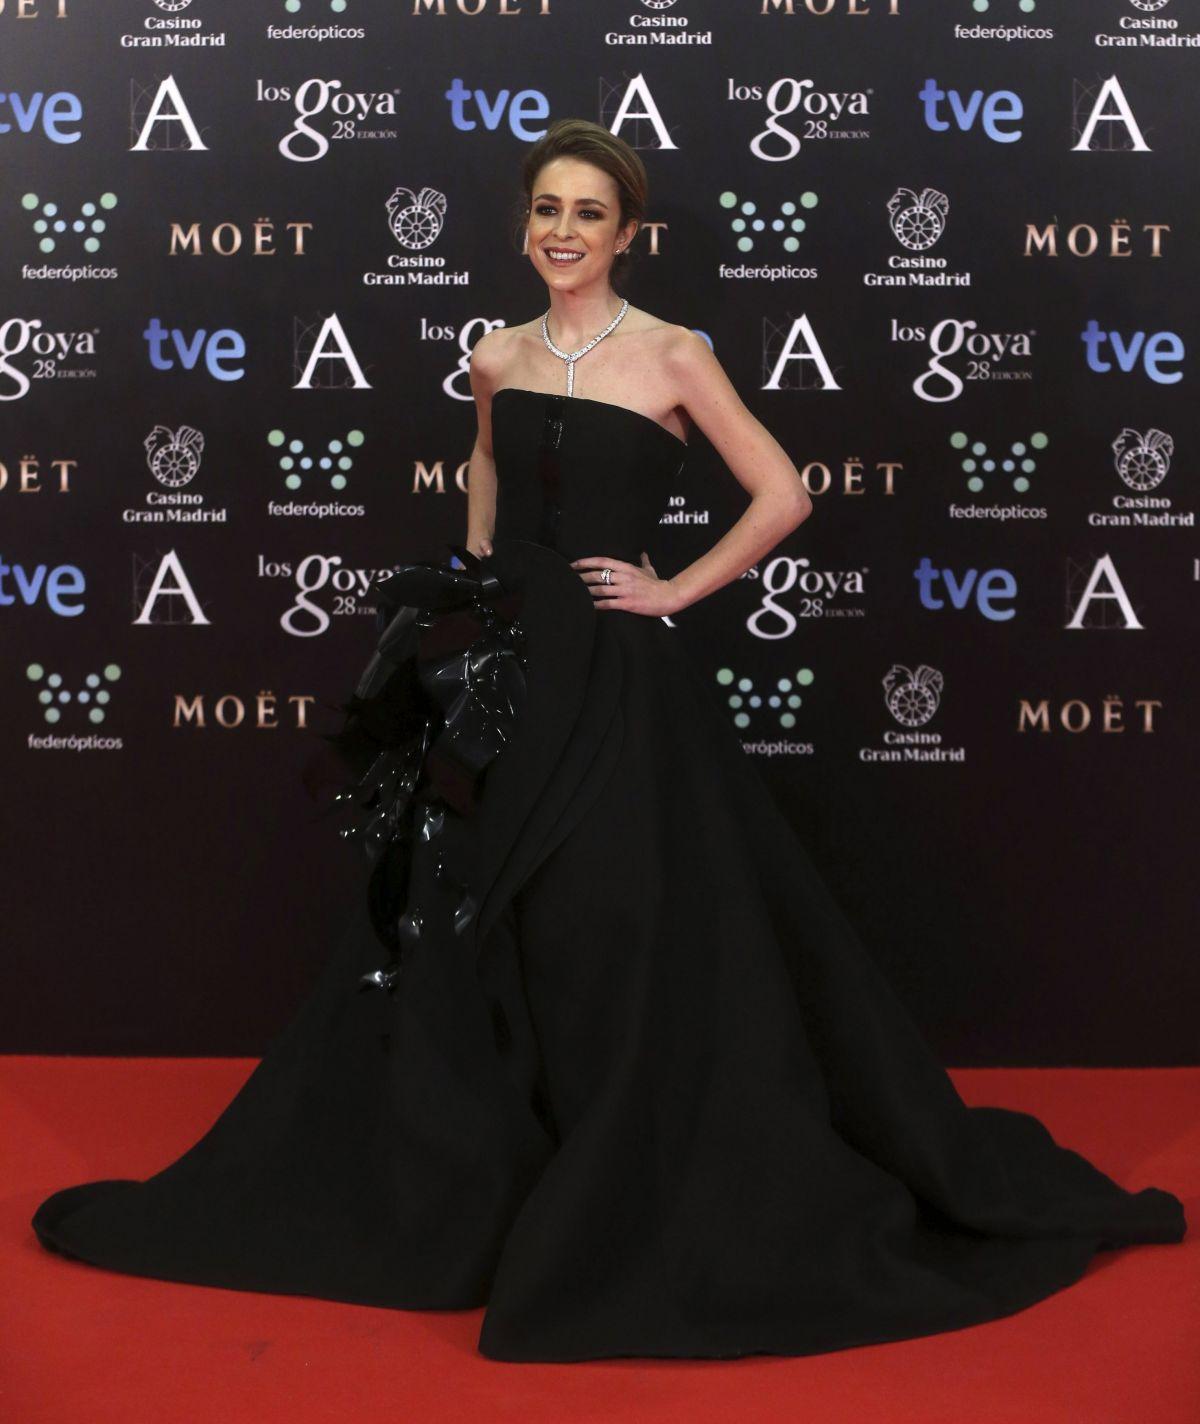 SILVIA ABASCAL at 2014 Goya Film Awards in Madrid